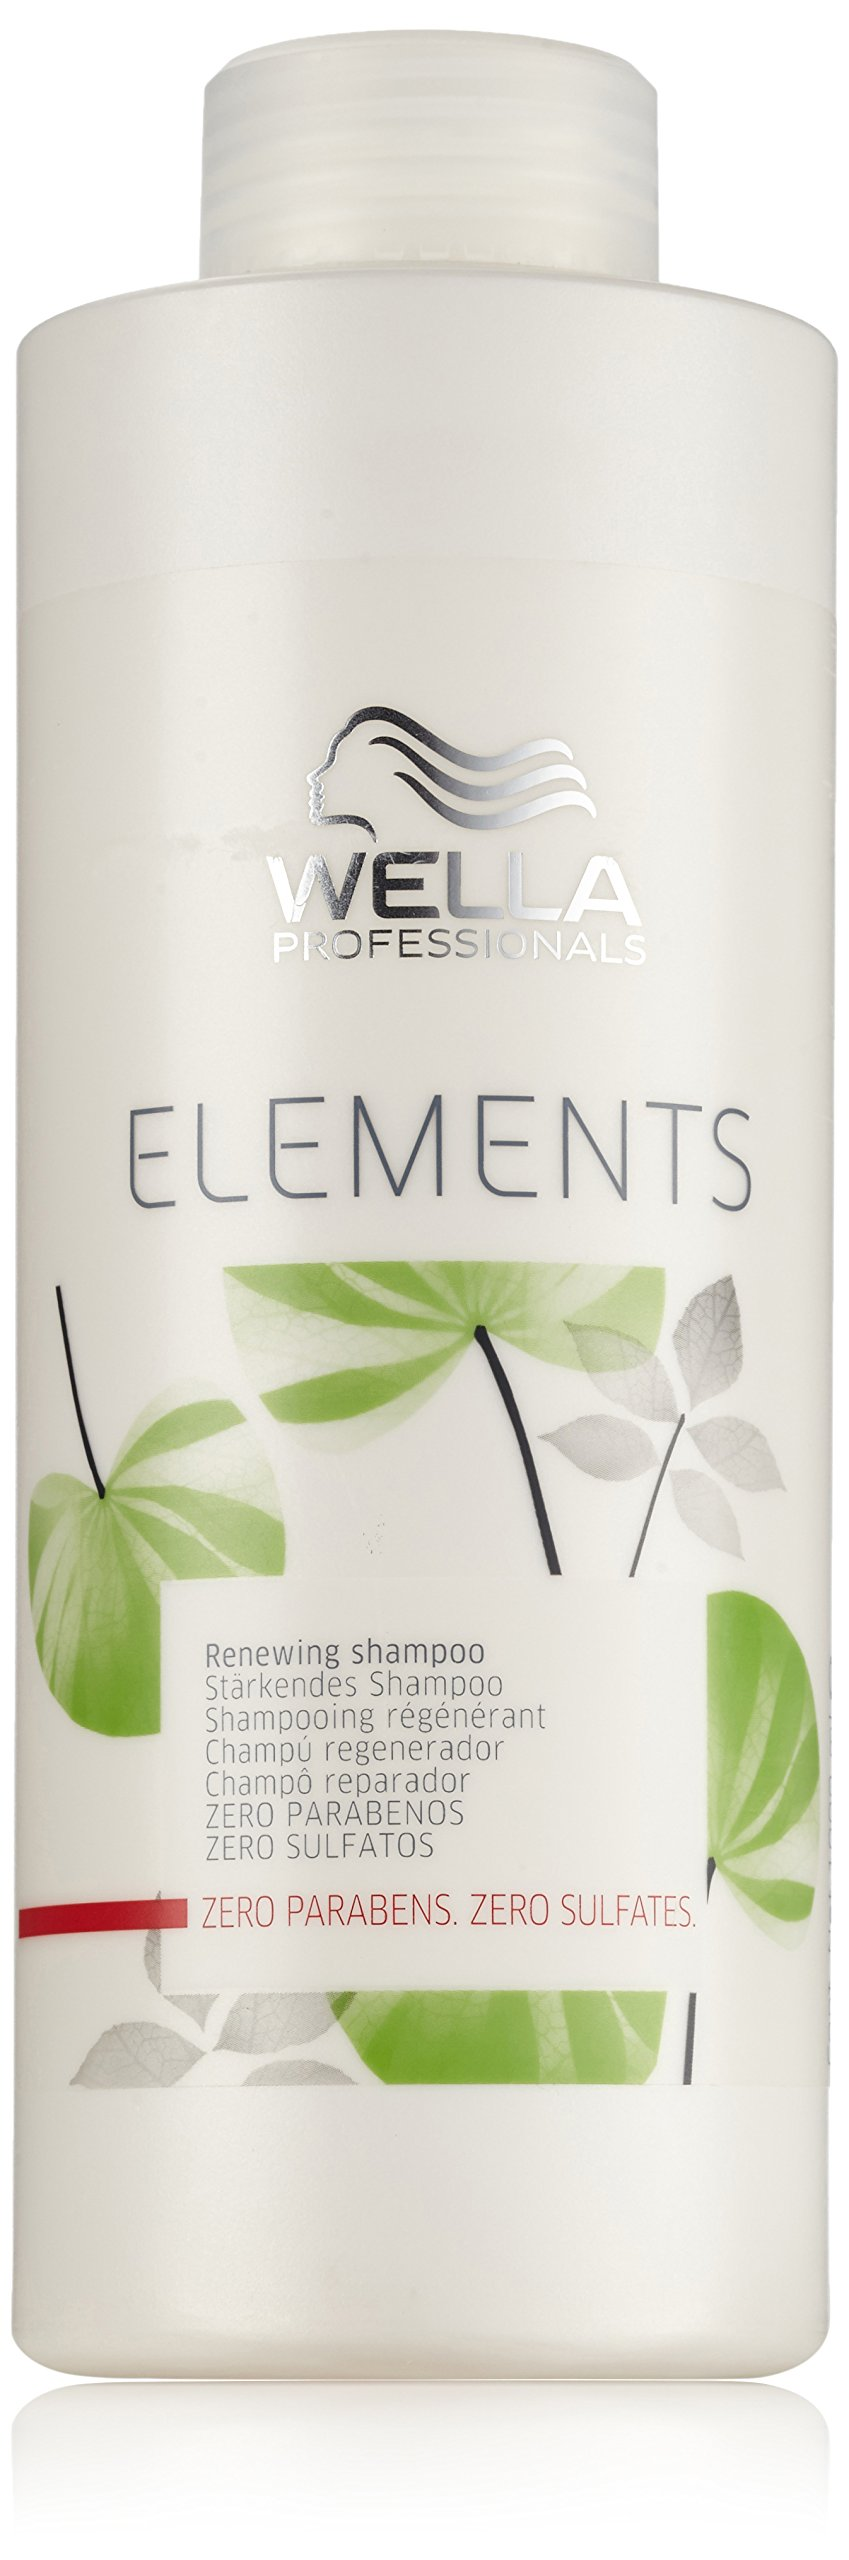 Wella Elements - Champú regenerator, 1000 ml product image